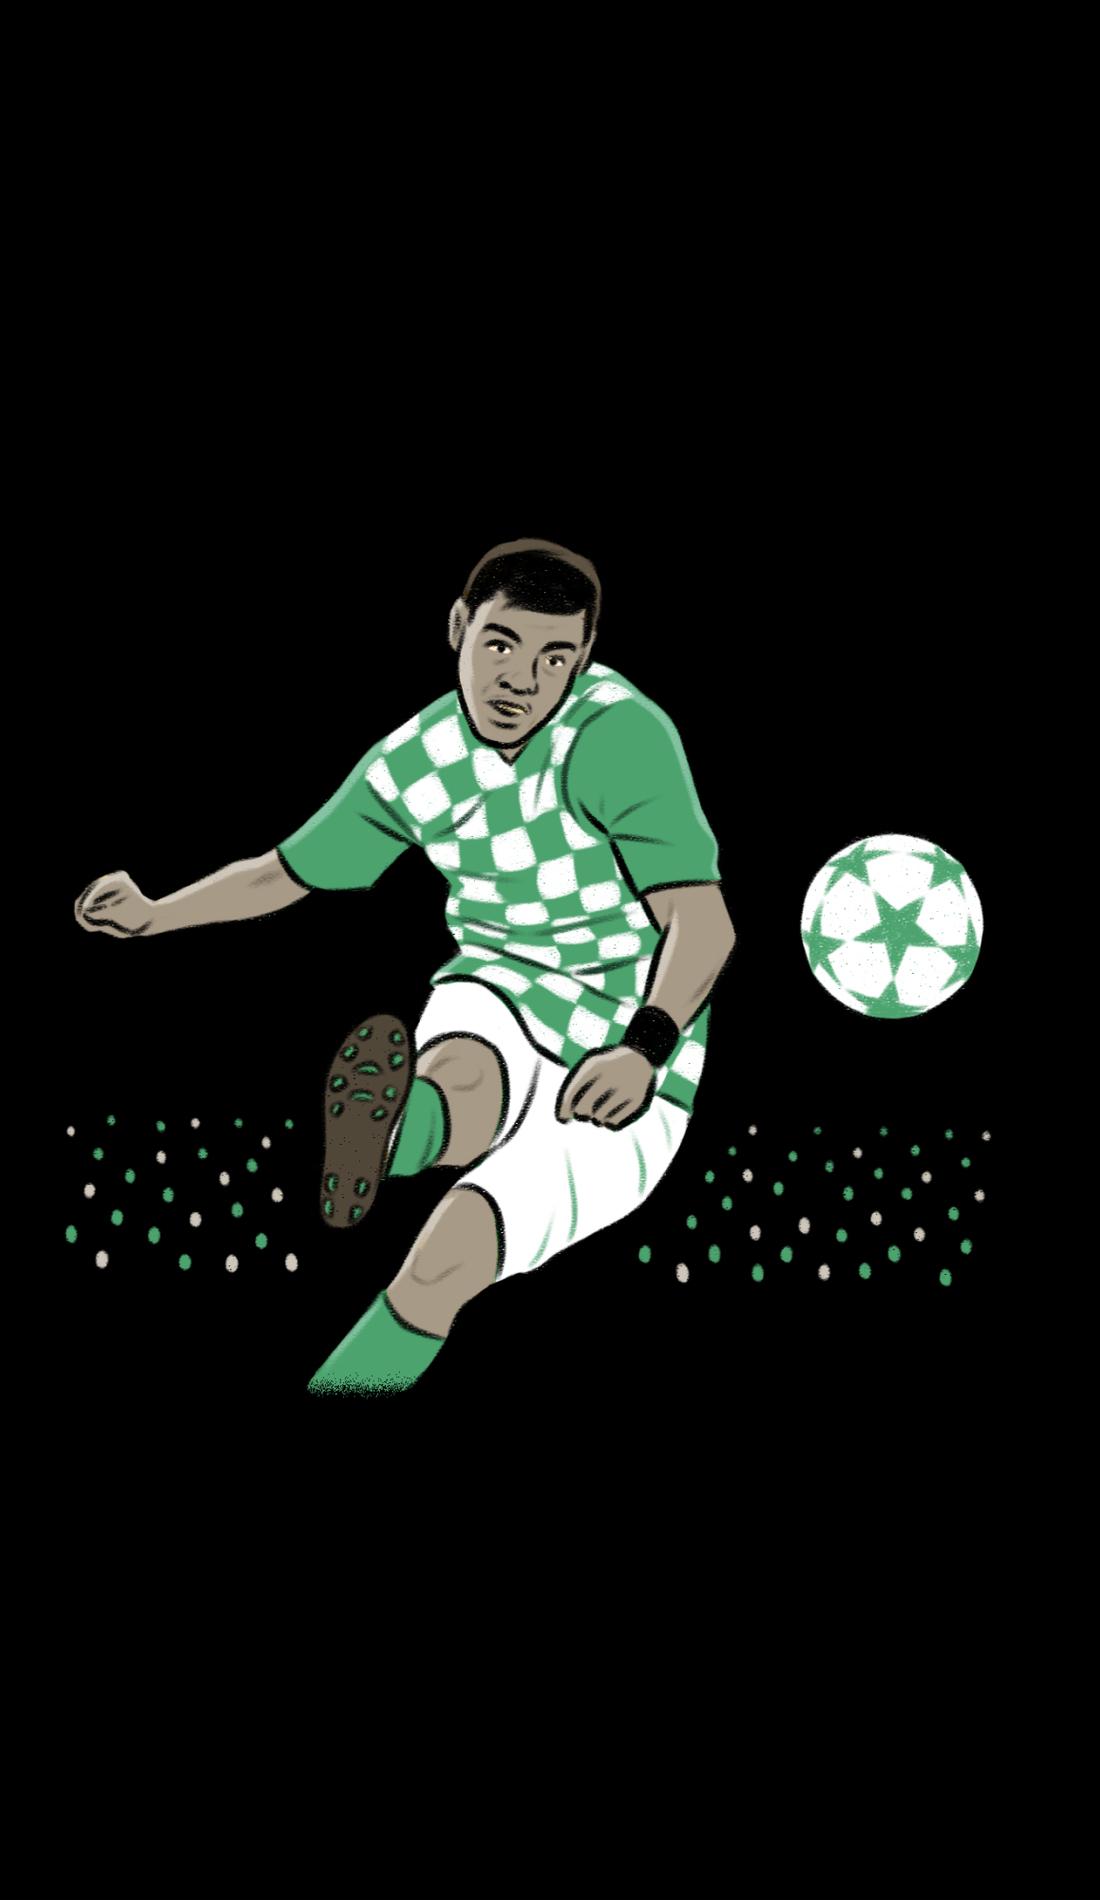 A U.S. Men's National Soccer Team live event